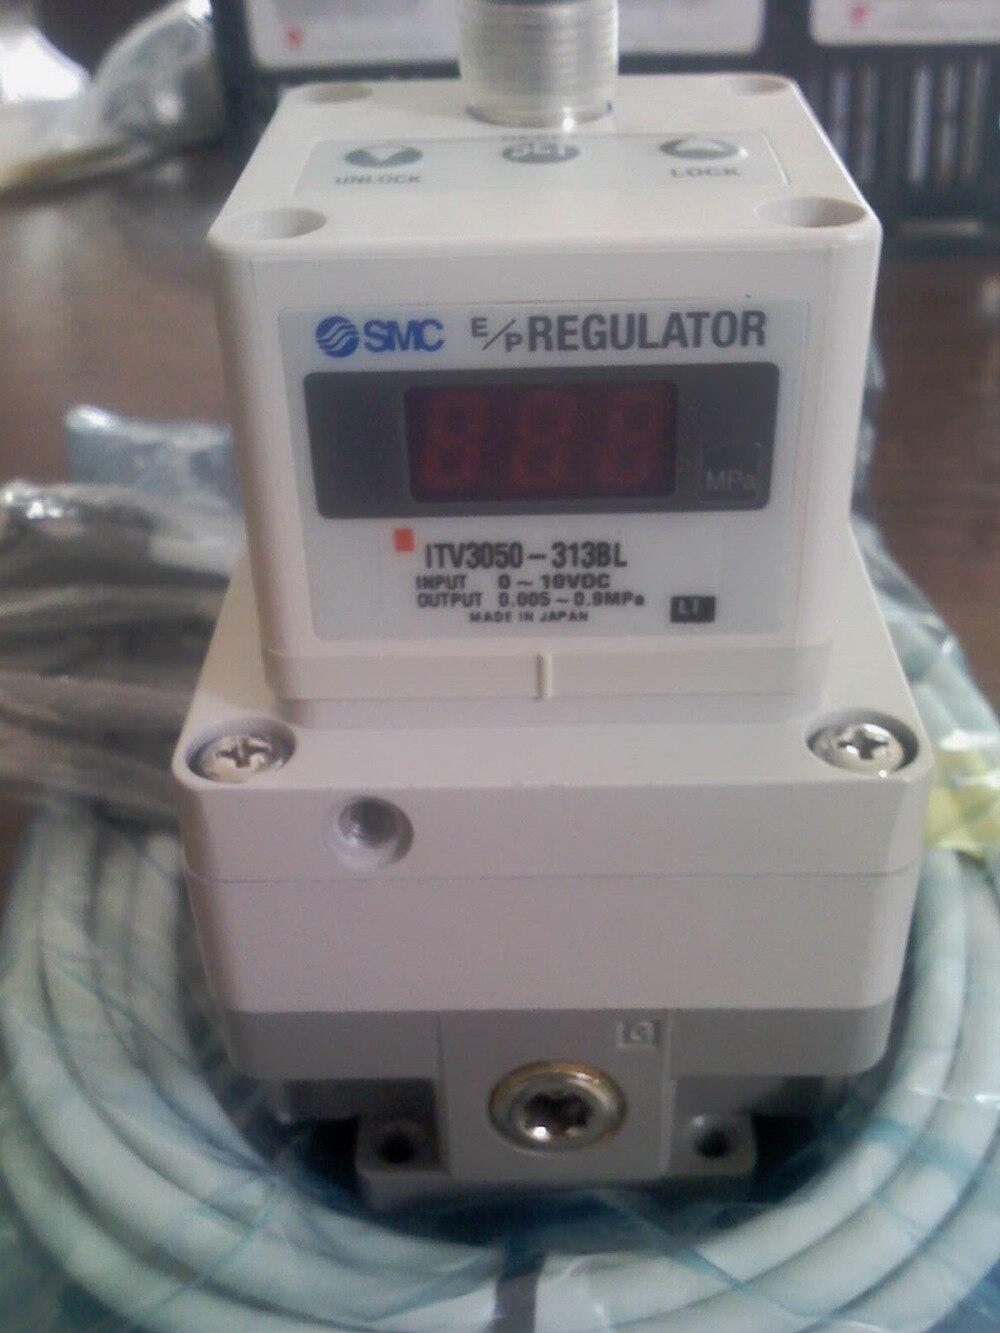 SMC ITV3050-312L  ELECTRO/PNEUMATIC REGULATOR, 24VDC Rc1/4 PORT NEW